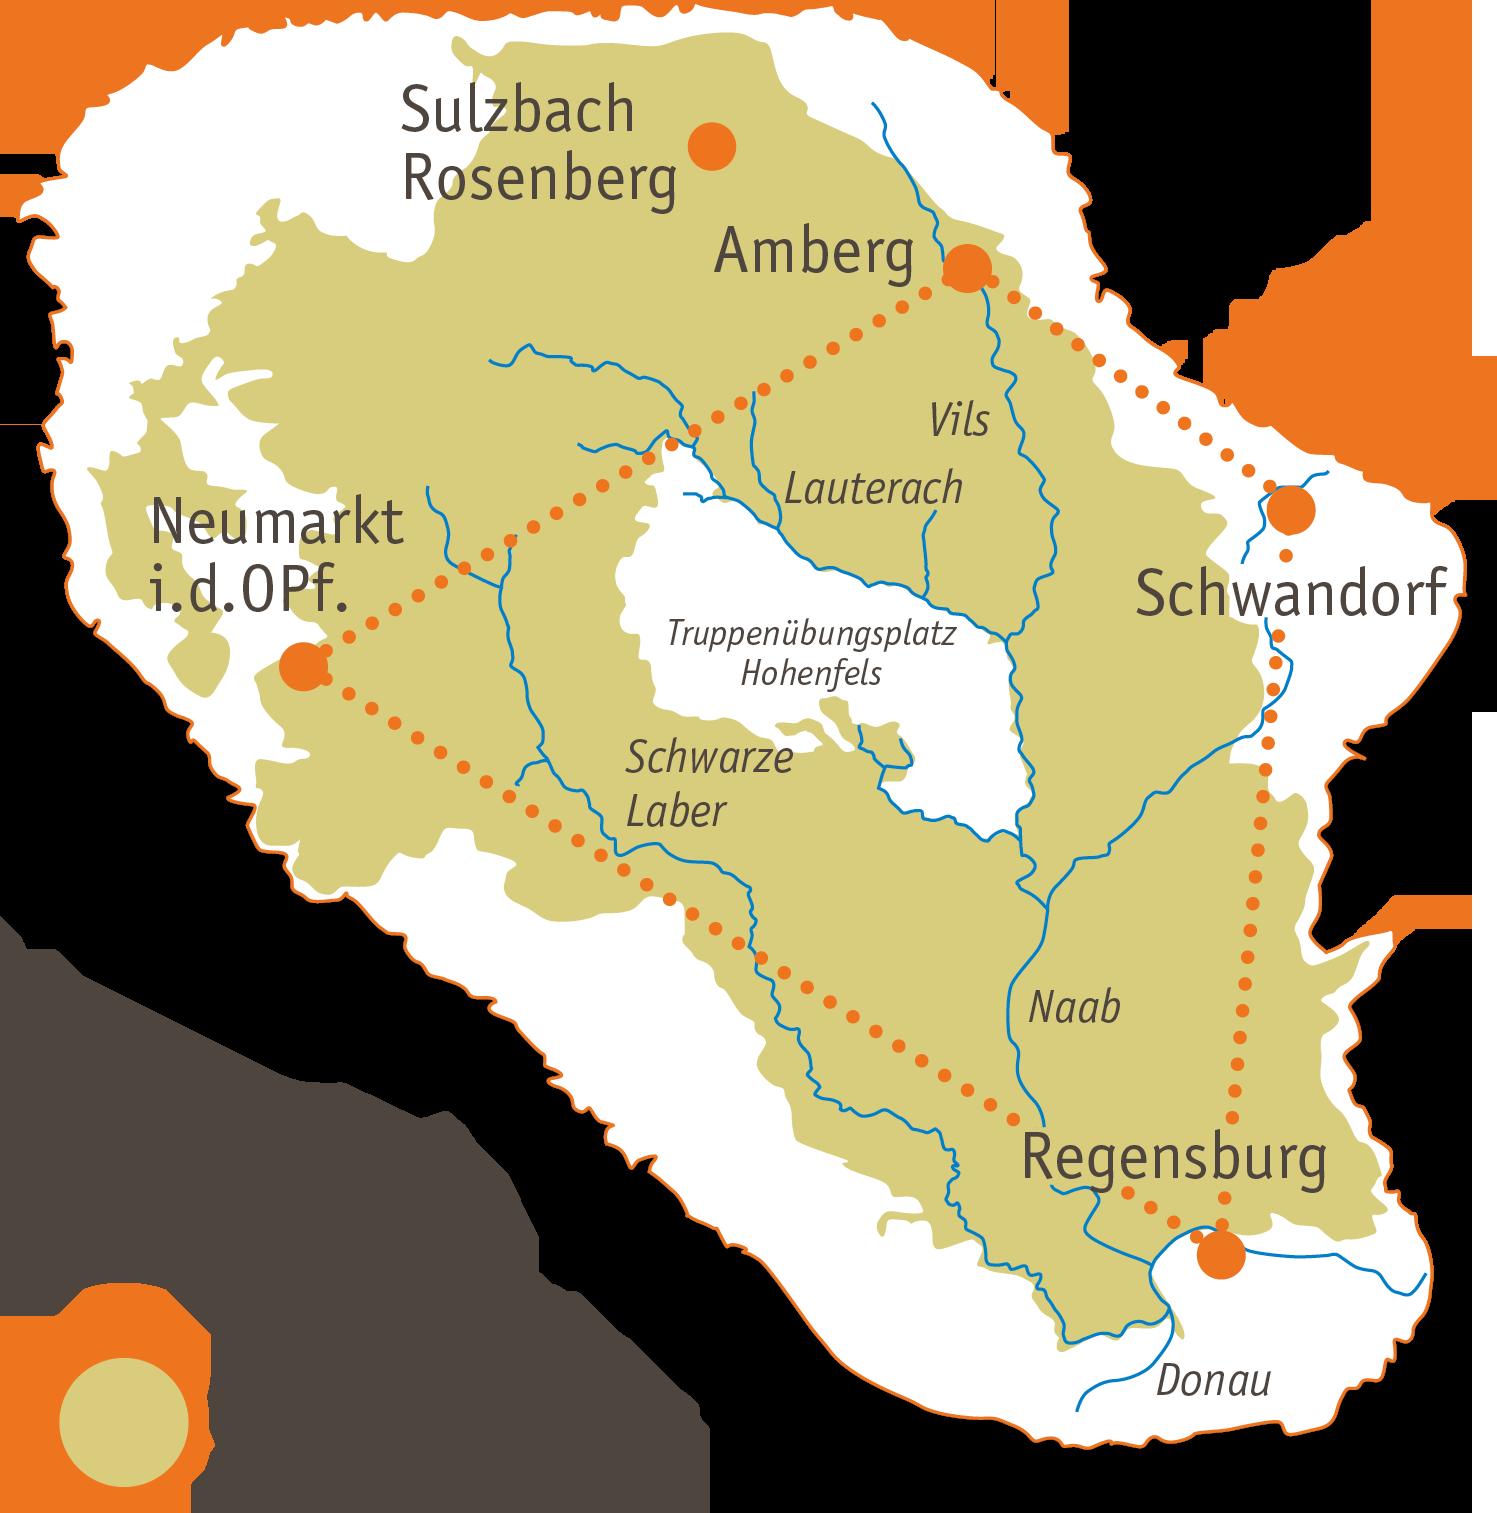 Karte des Projektkerngebiets Juradistel u.a. mit Amberg, Neumarkt i.d. OPf., Regensburg und Schwandort